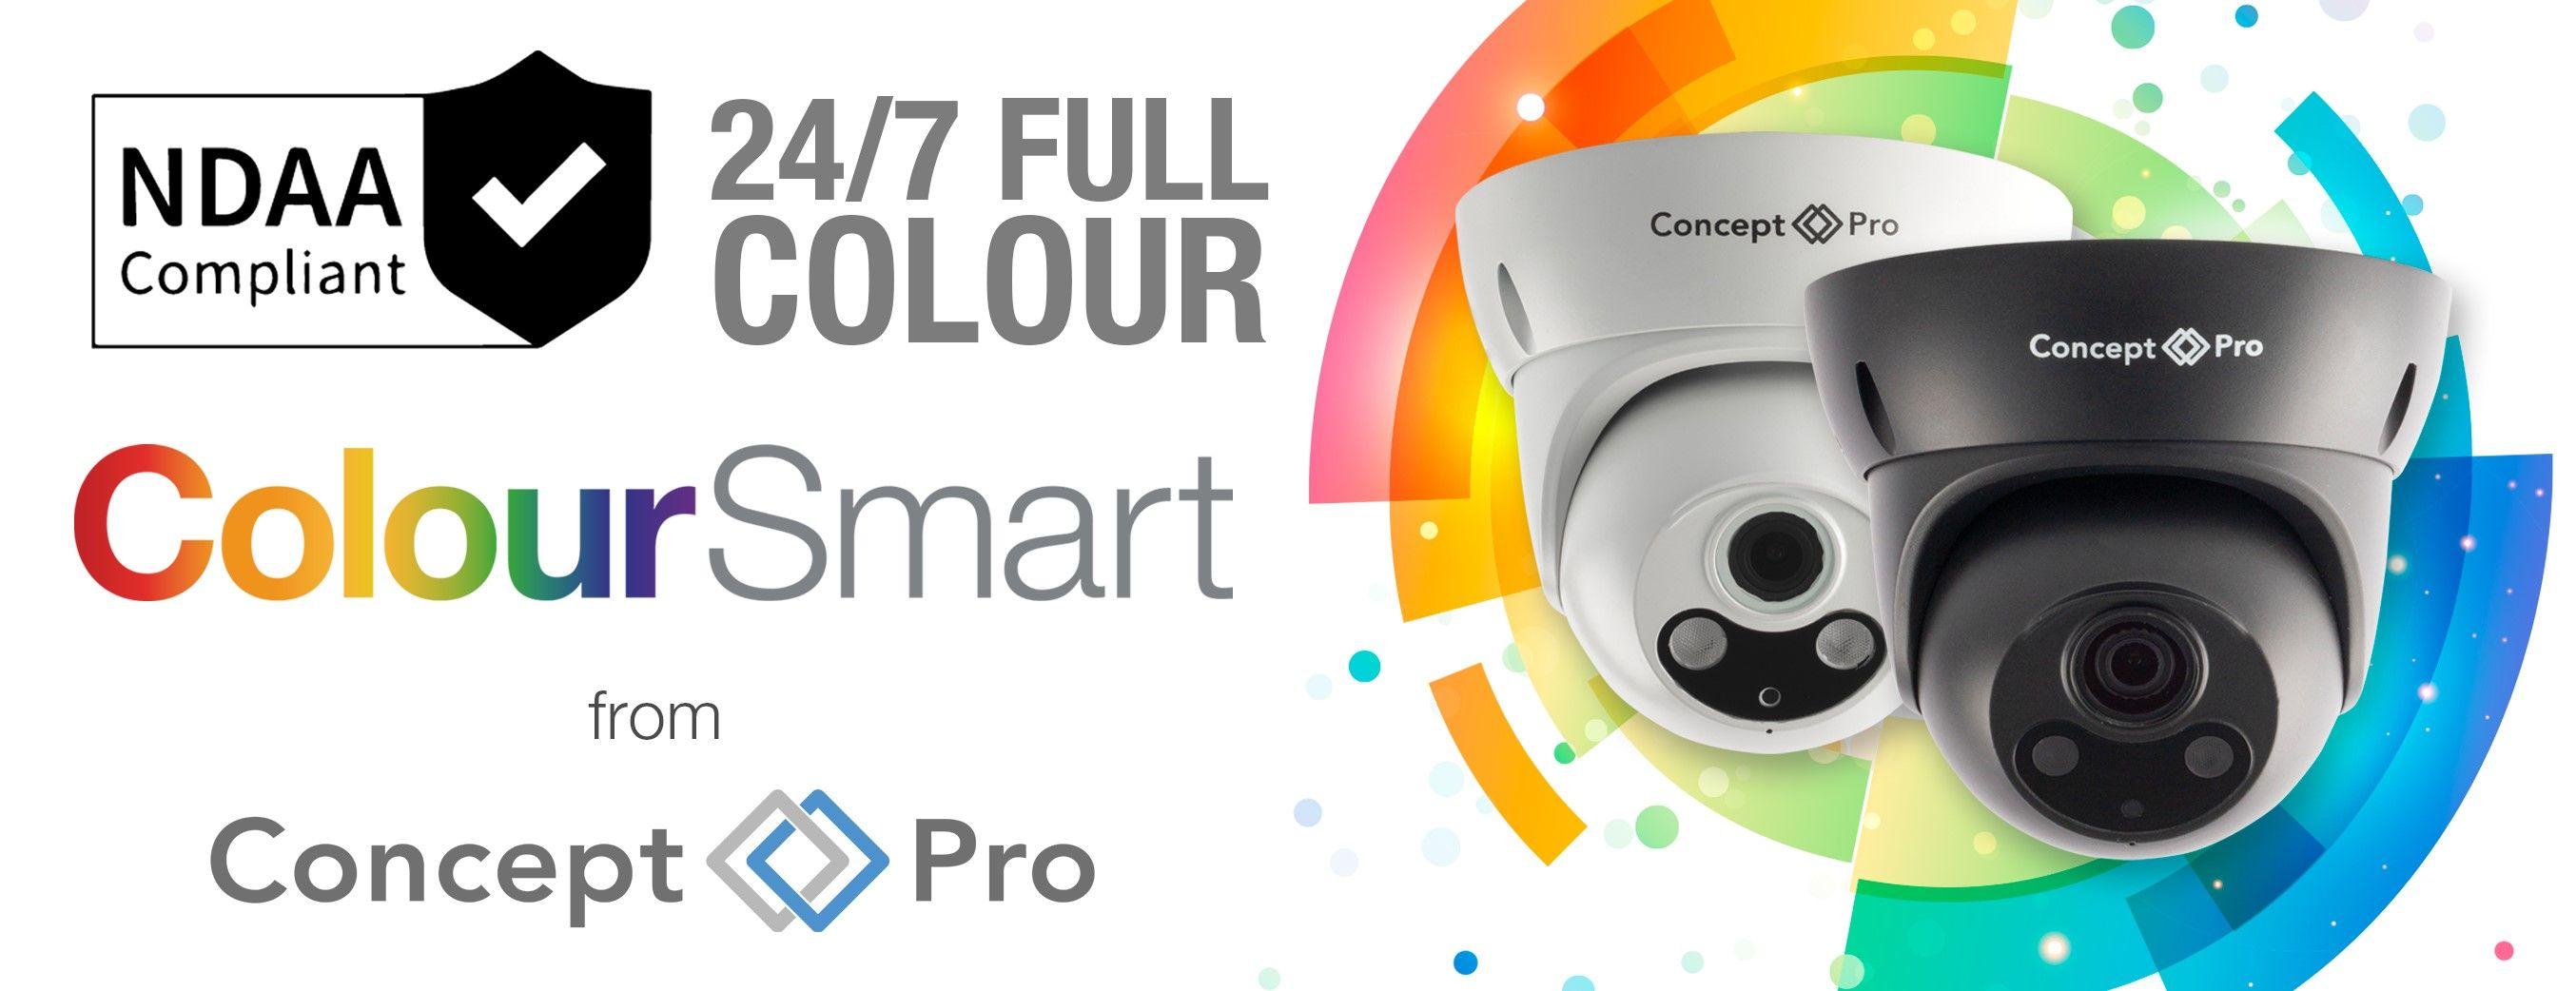 Meet ColourSmart from Concept Pro